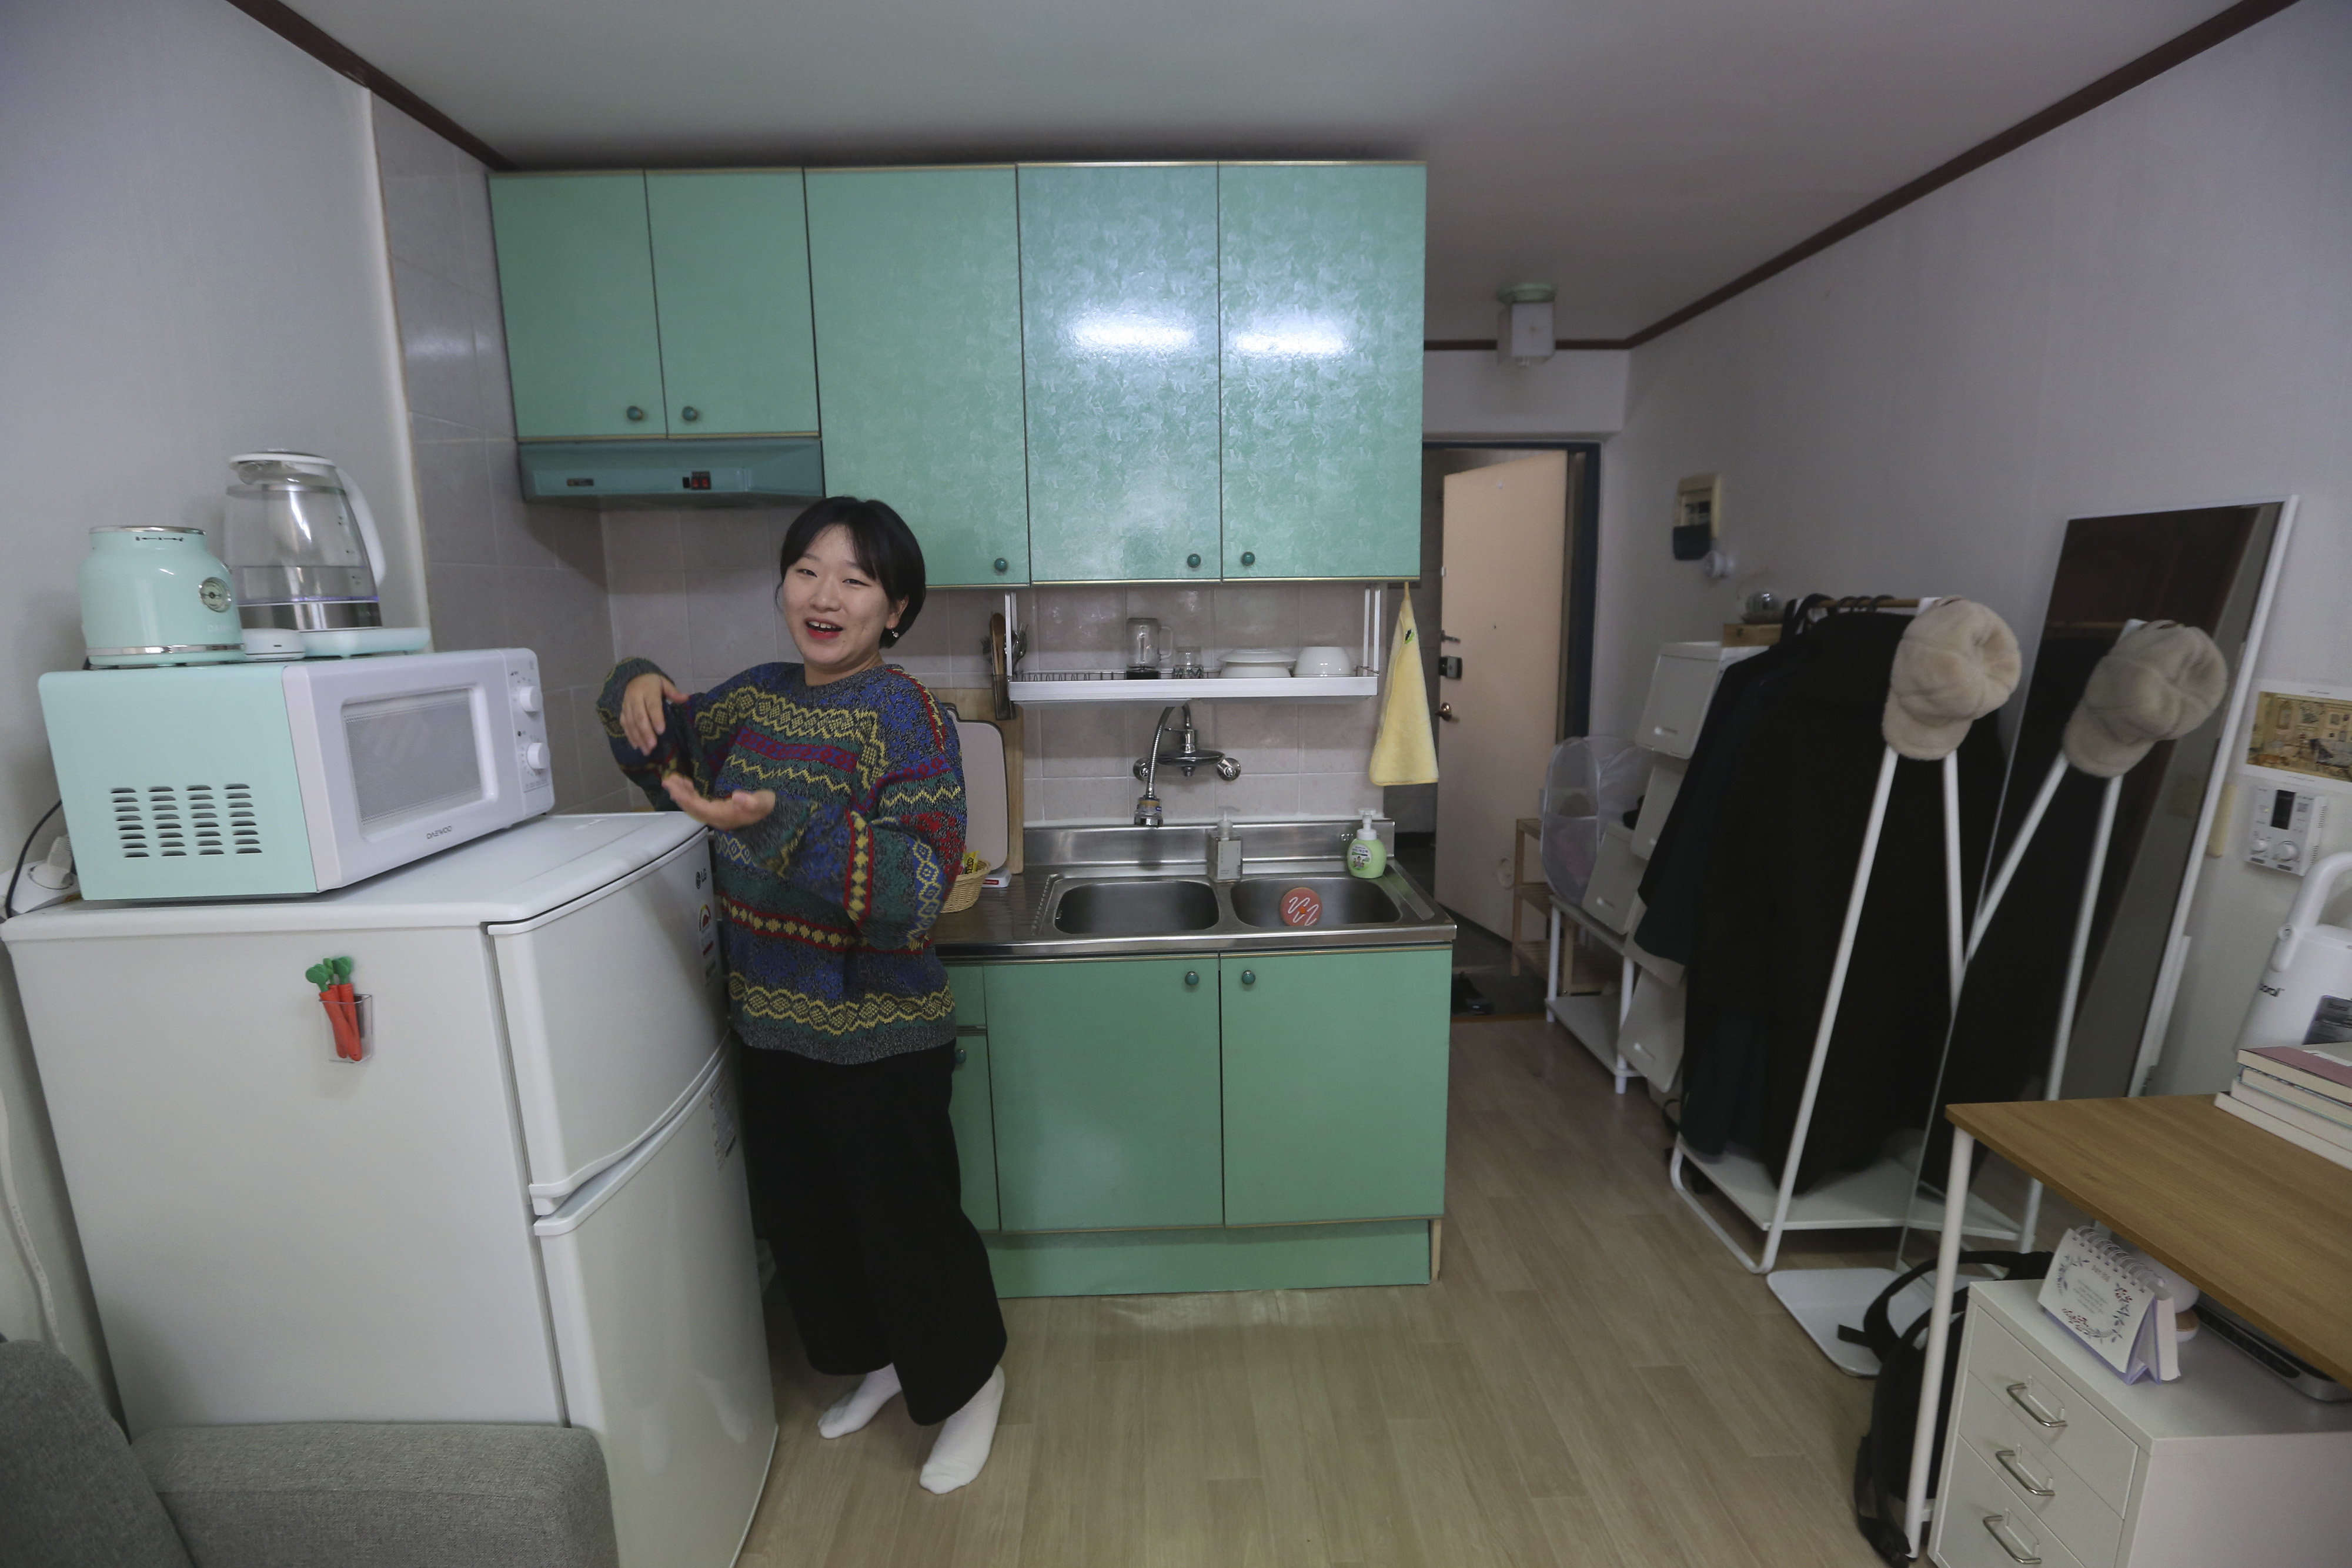 Kim Da-hye, a 29-year-old South Korean, talks about her semi-basement apartment in Seoul, South Korea, Saturday, Feb. 15, 2020.